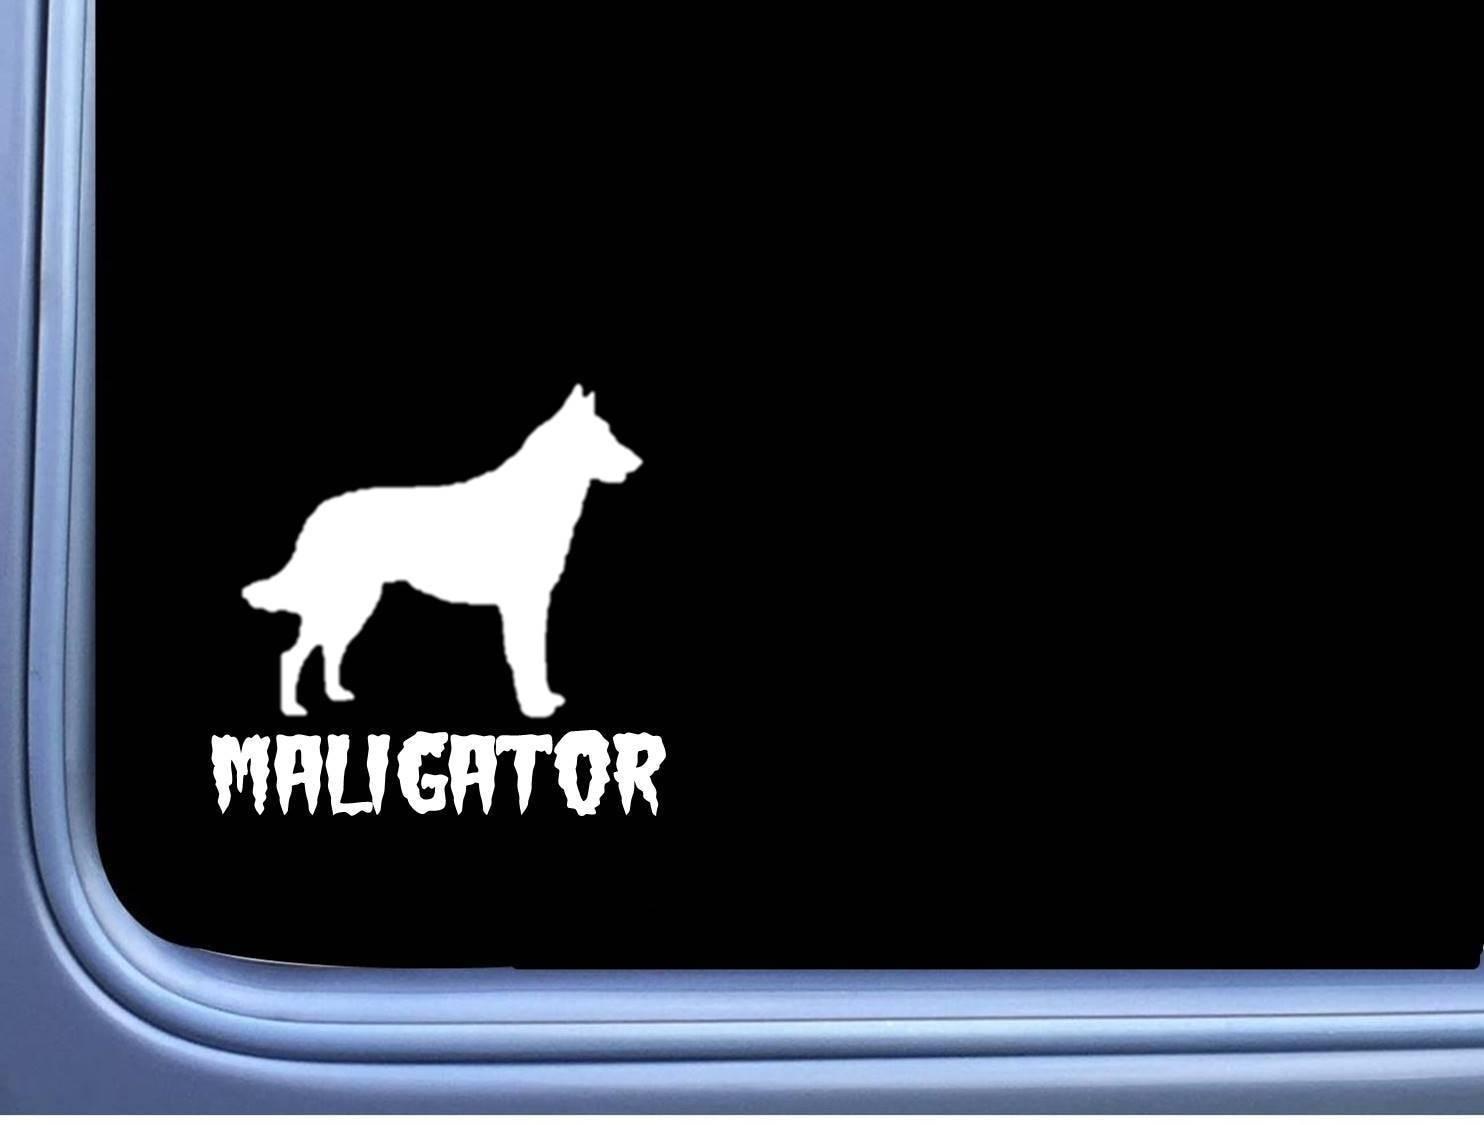 Para Maligator Belgian malois M350 6 pulgadas pegatina perro precaución k9